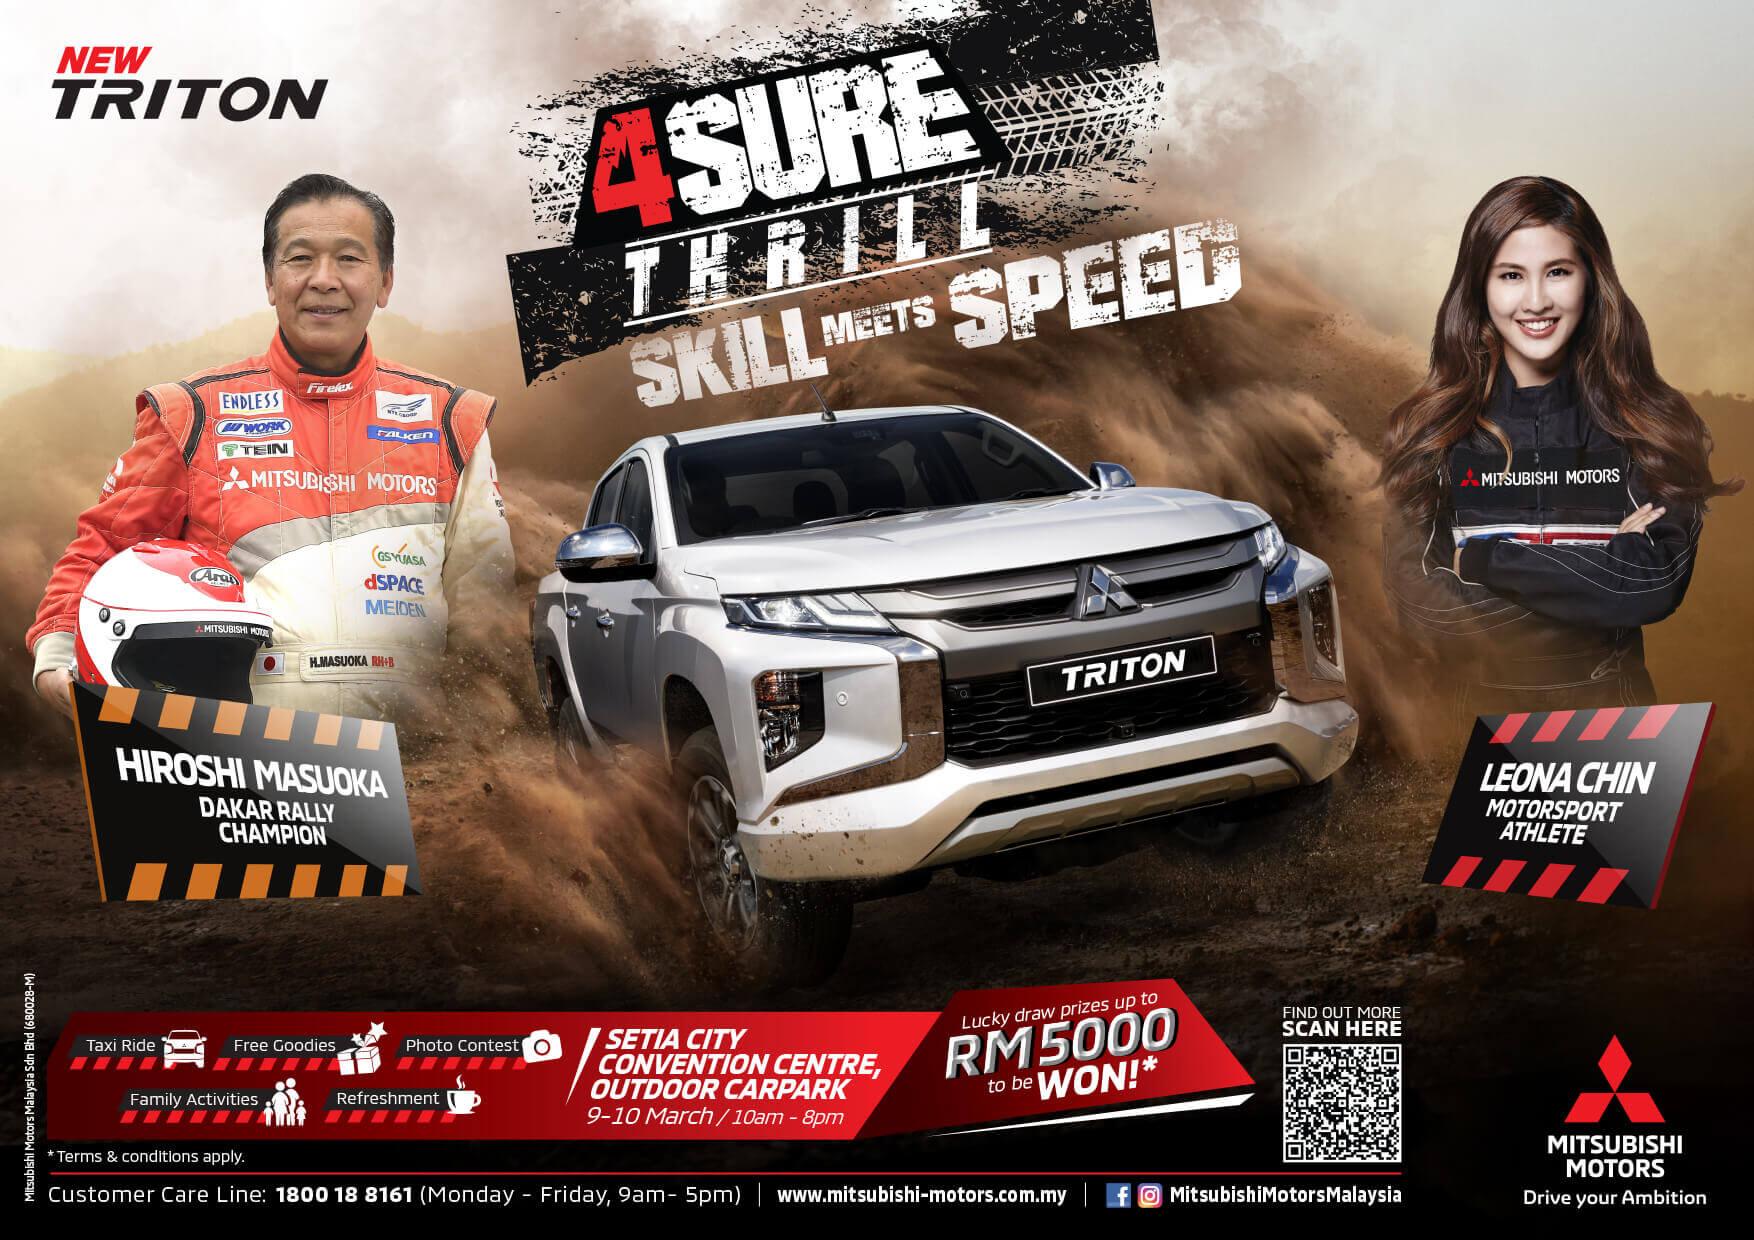 4Sure event Setia City | Mitsubishi Motors Malaysia